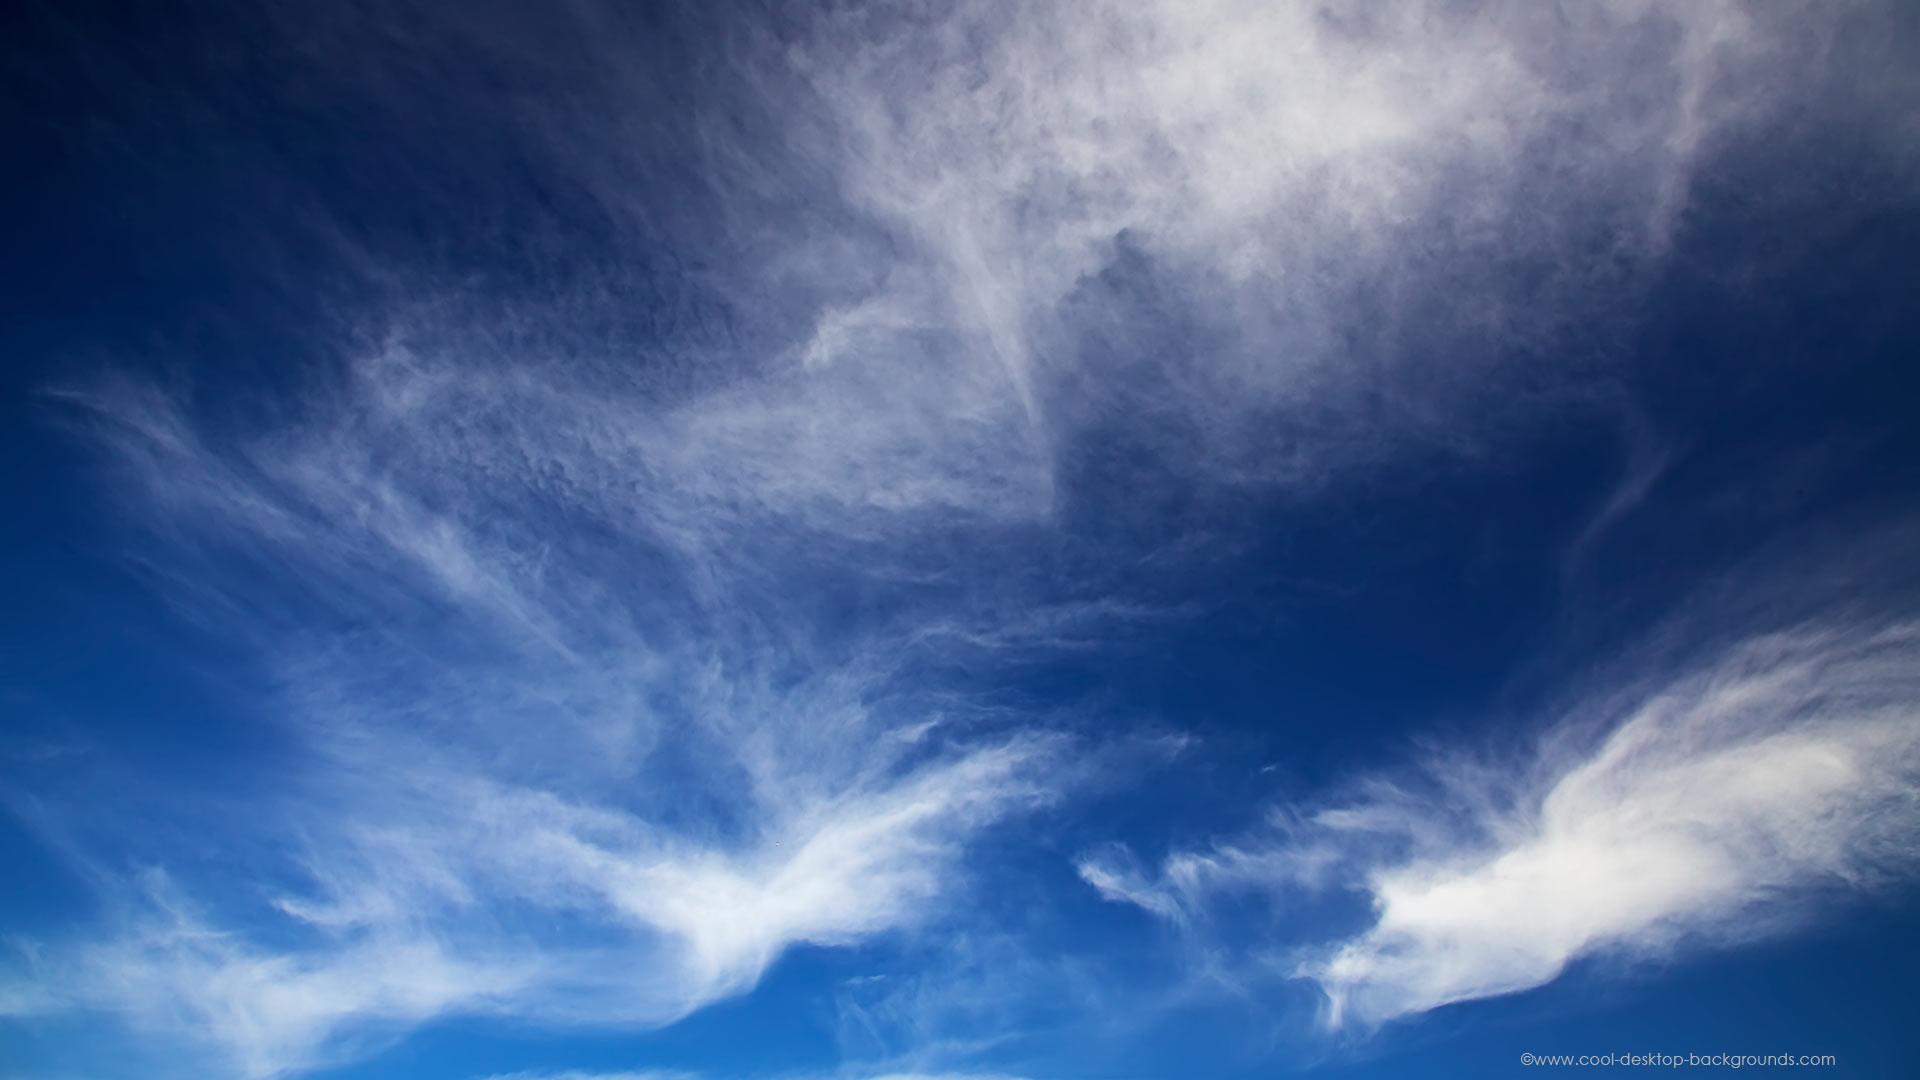 Cloud Desktop Background Wallpapertag